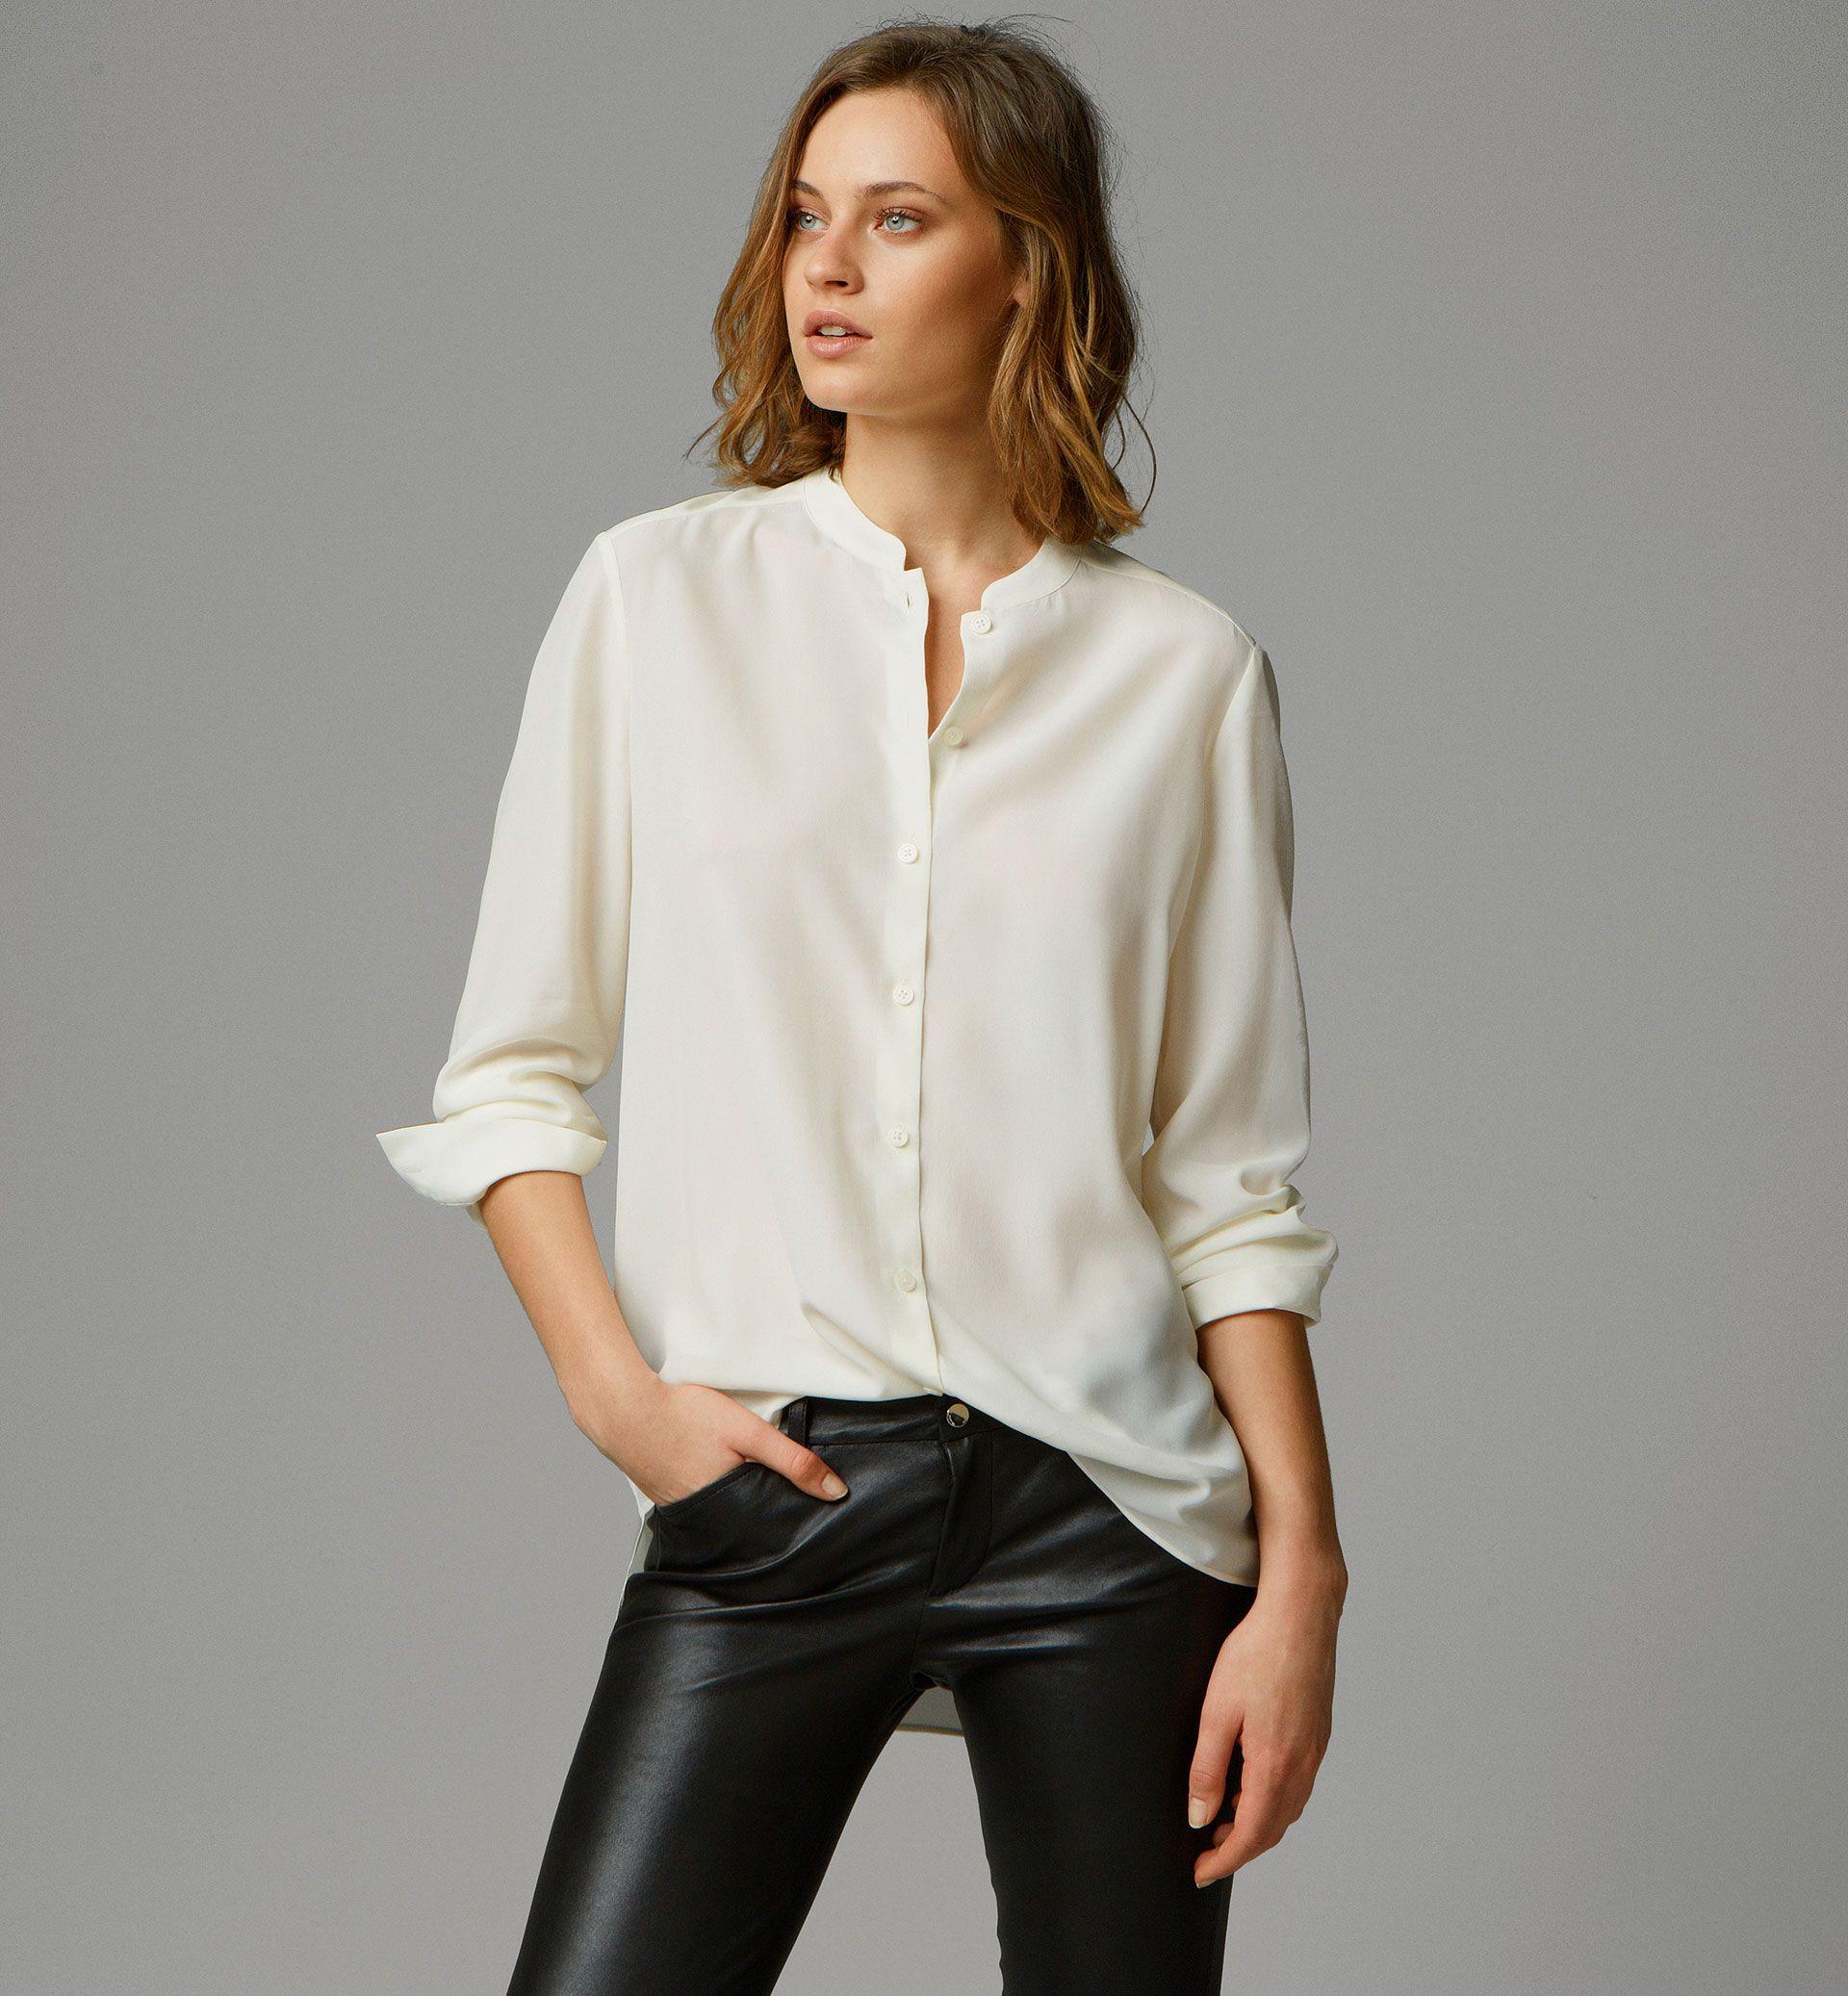 Mandarin collar shirt view all shirts blouses